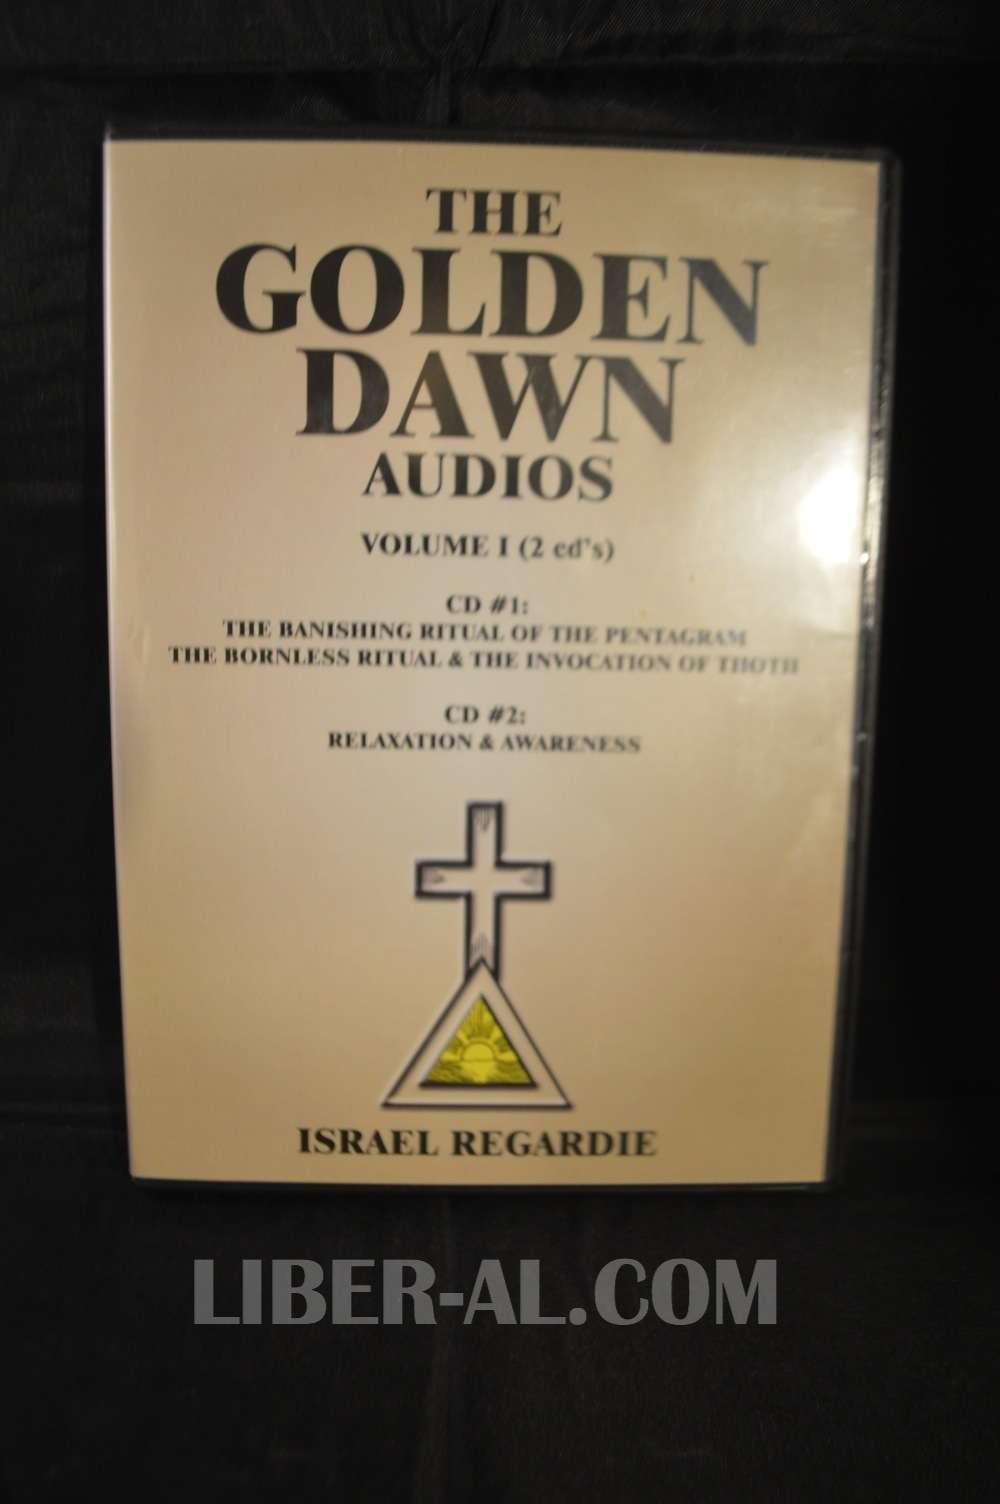 THE GOLDEN DAWN AUDIOS: VOLUME I (2 AUDIO CD'S)